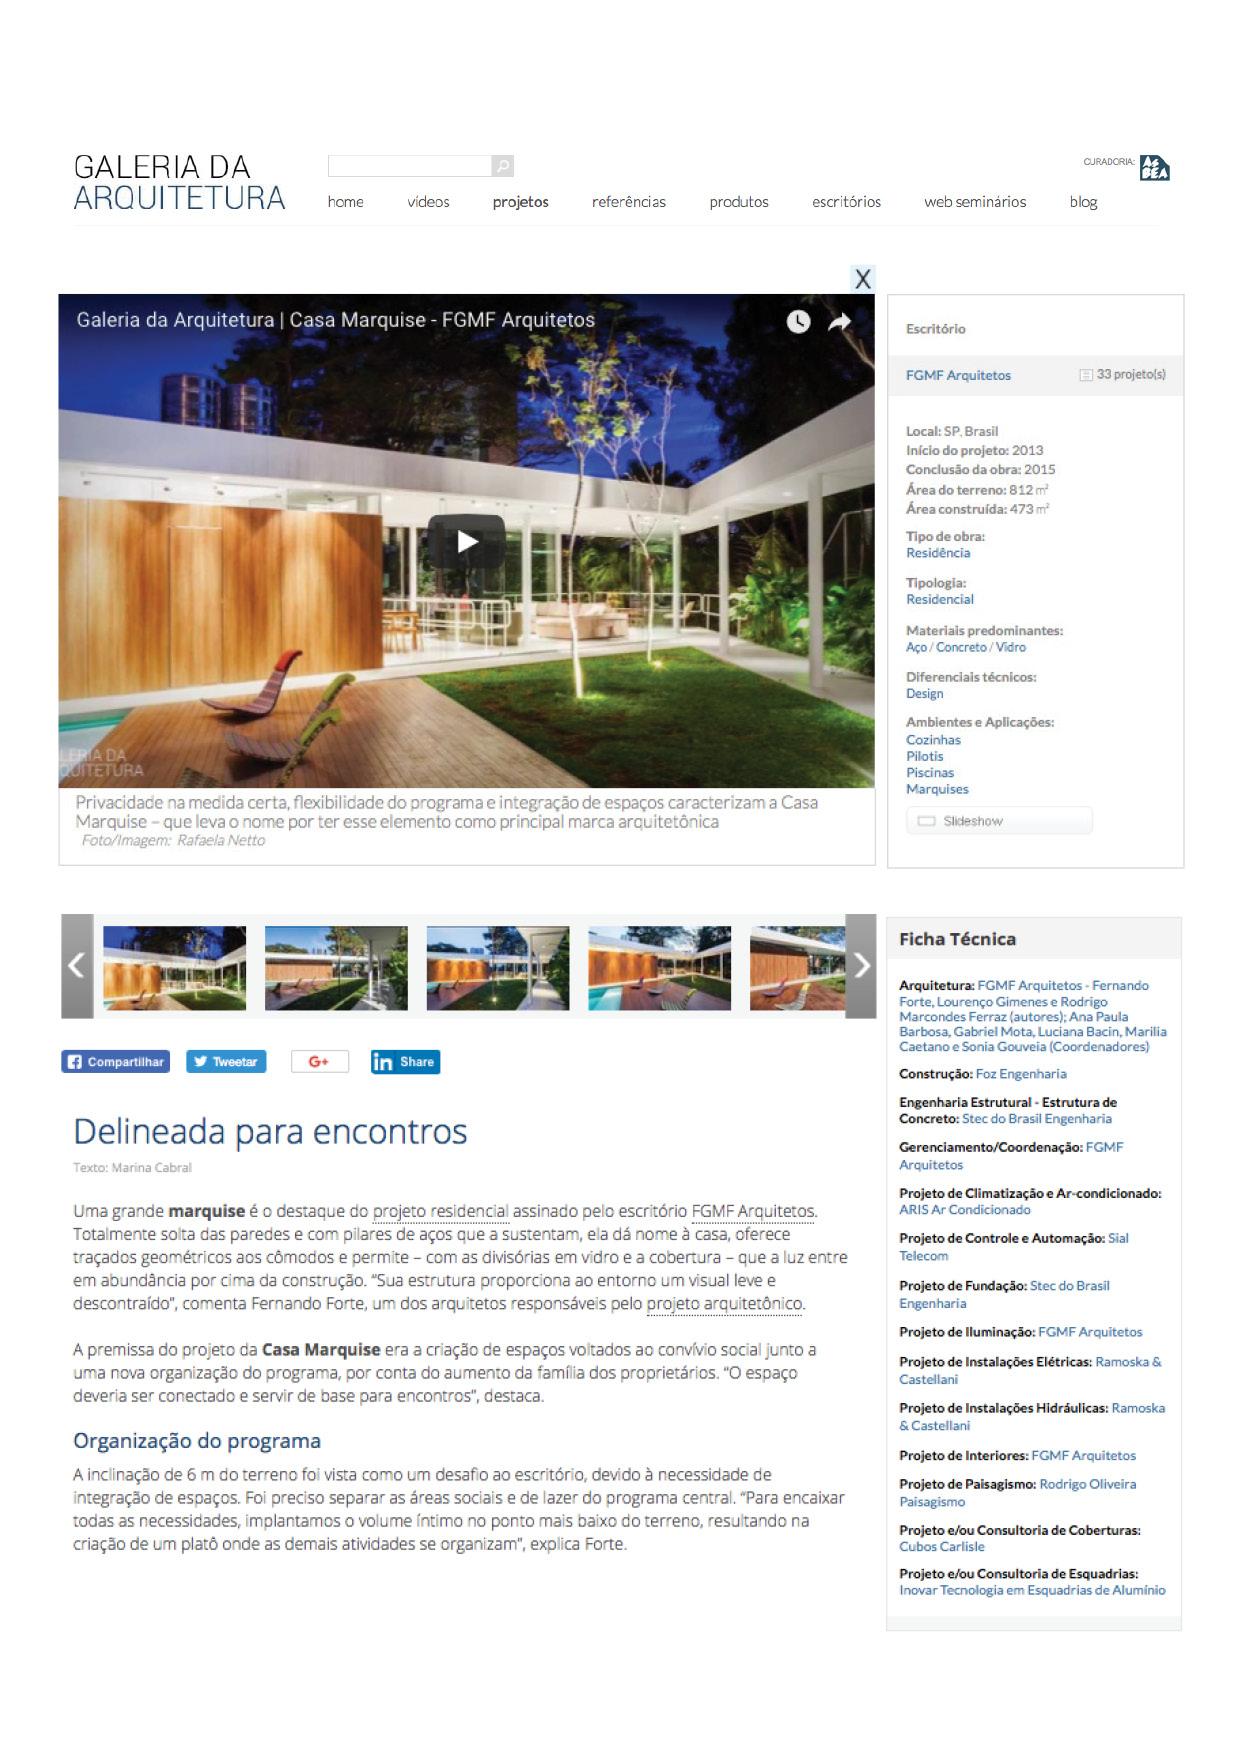 Galeria da Arquitetura | Casa Marquise - março 2018